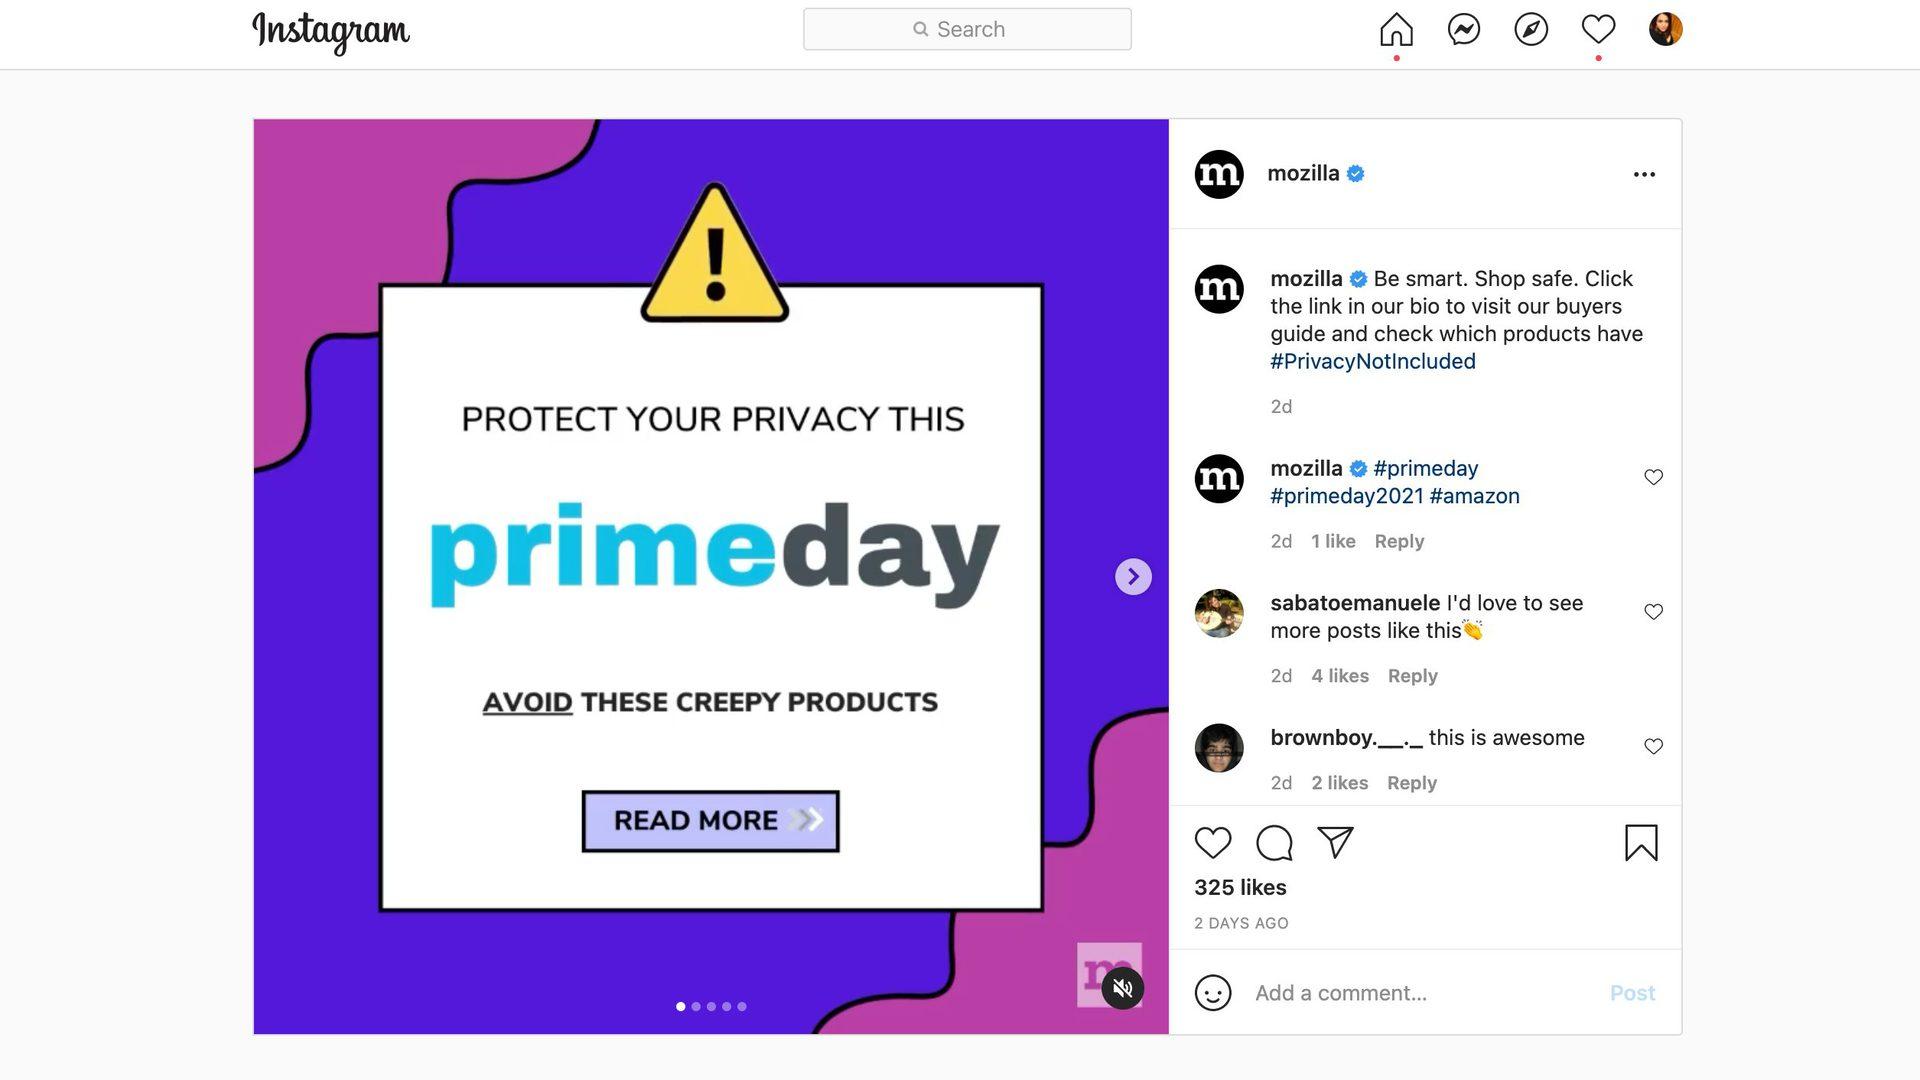 Mozilla Prime Day 2021 Creepy Products list